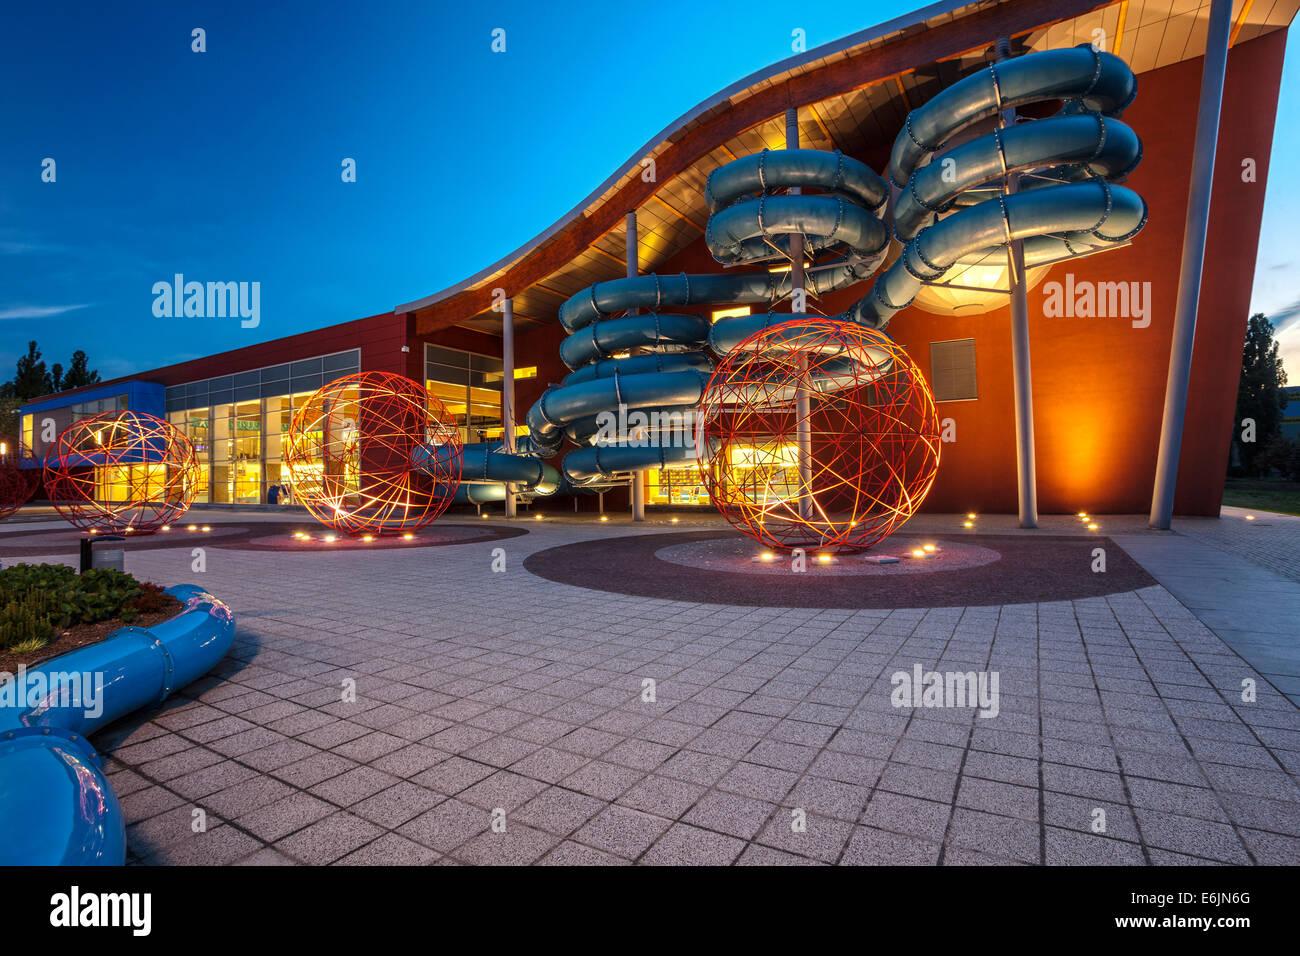 Olympic swimming pool in Olsztyn Poland - Stock Image